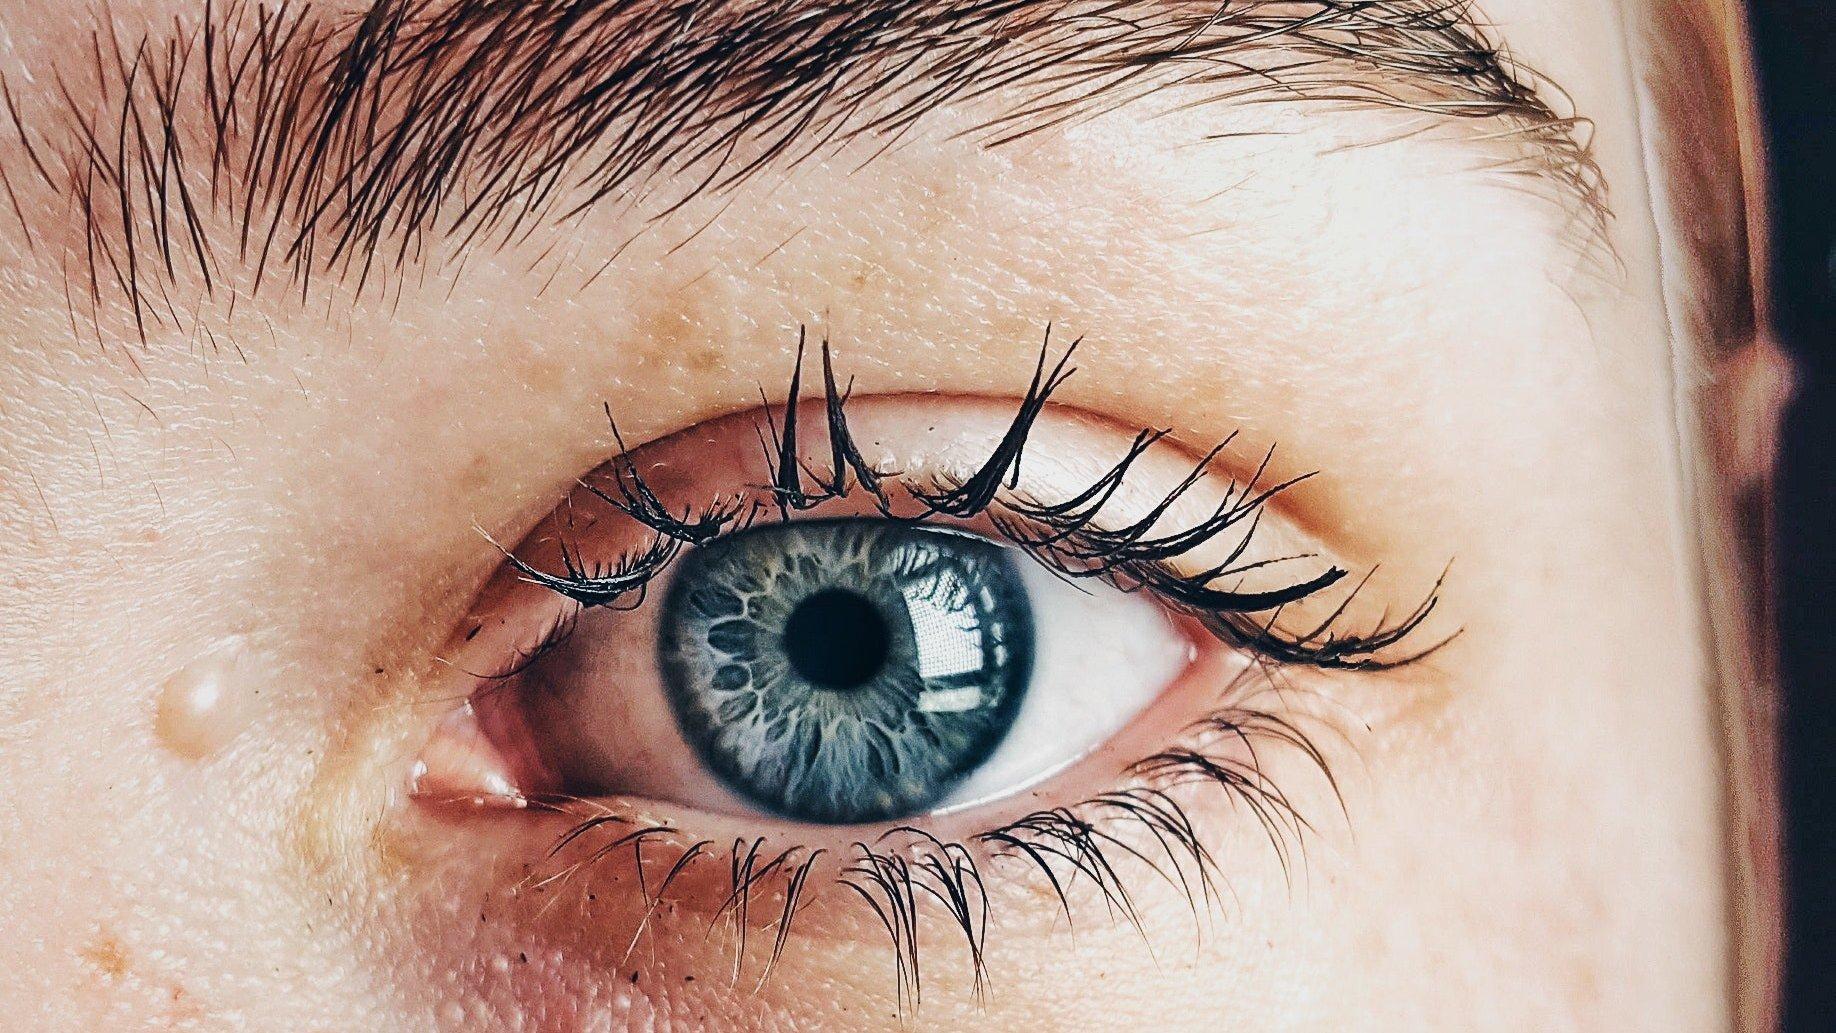 beautiful-blue-eyes-close-up-dhyamis-kleber-609549-2